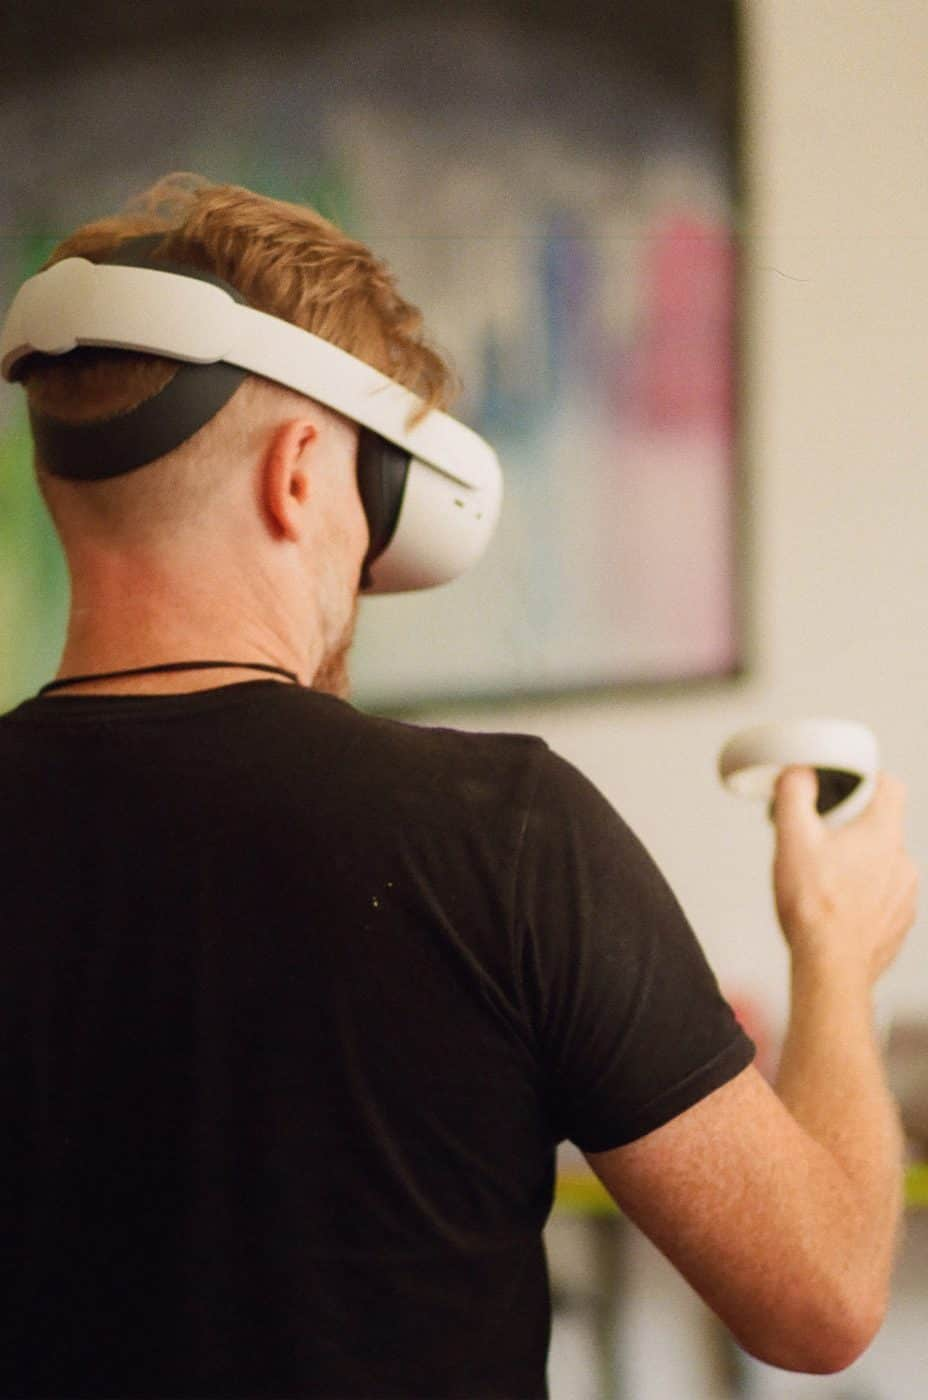 virtual reality artist Lee Mason, aka Metageist